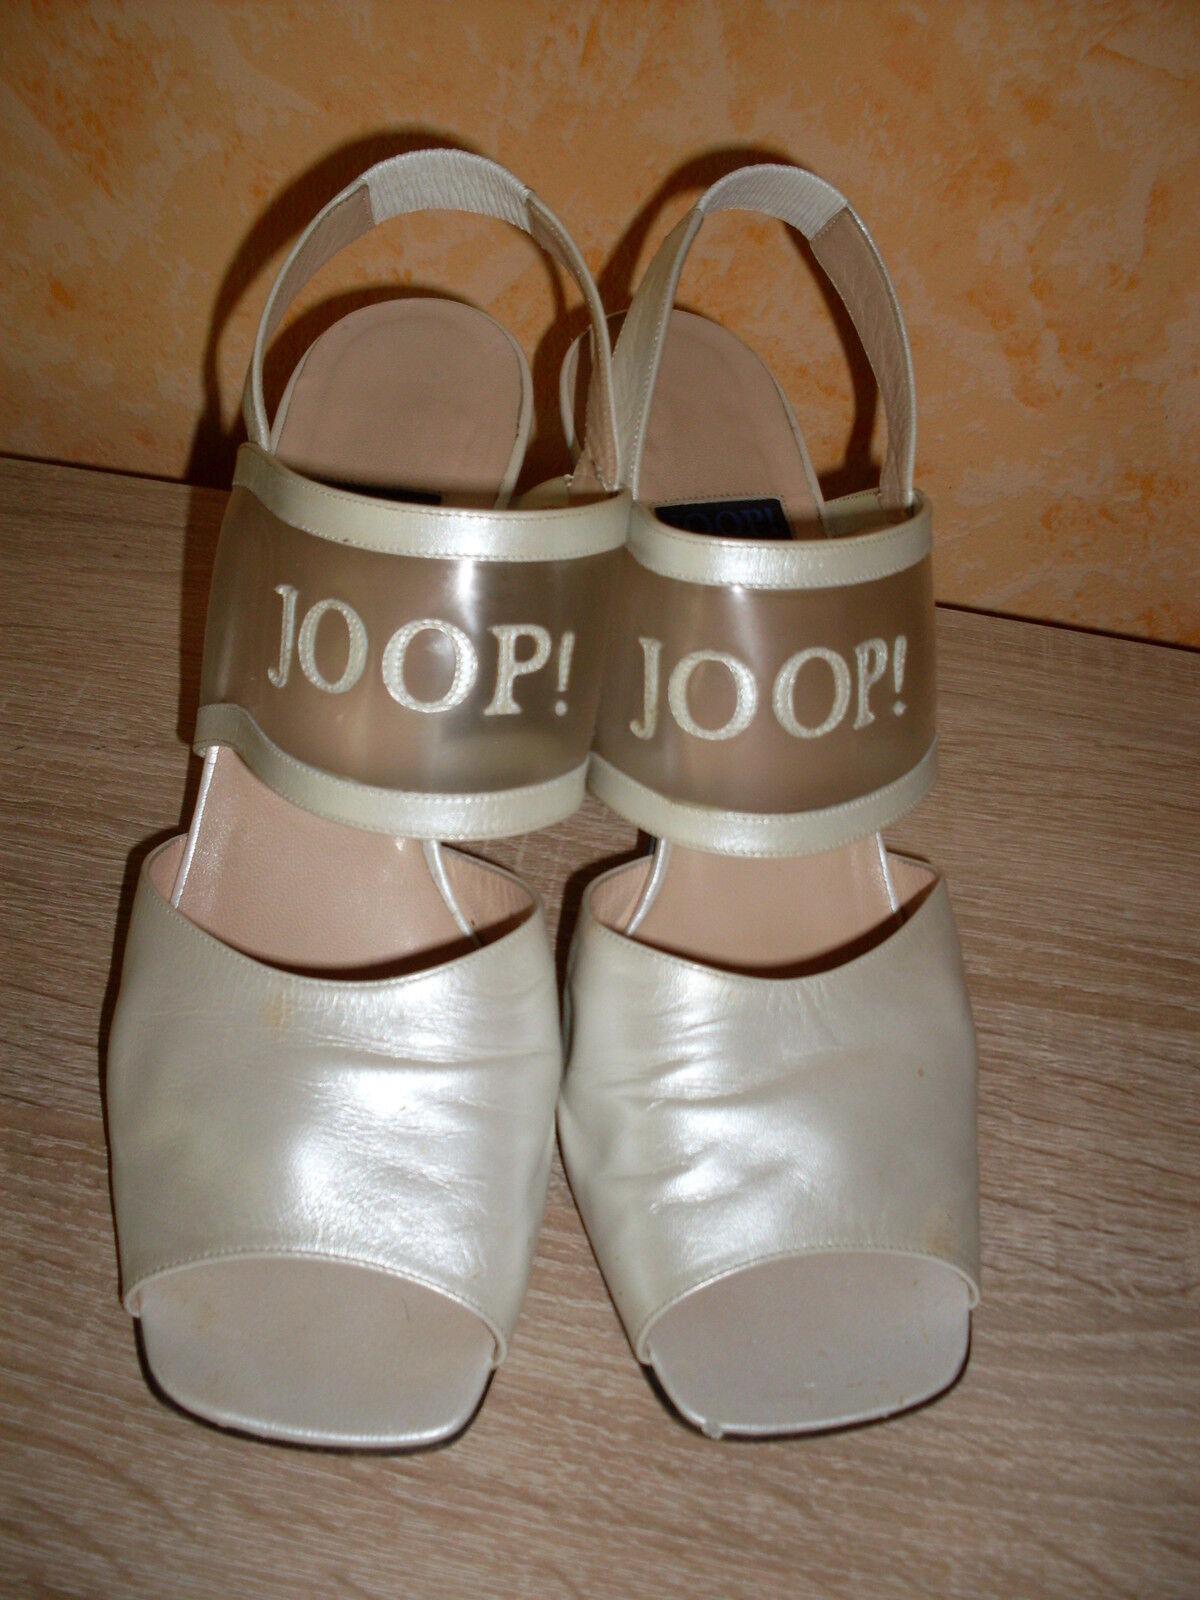 JOOP   Sandaleette in perle Leder super edel Gr. 40,5 einfach mal ansehen